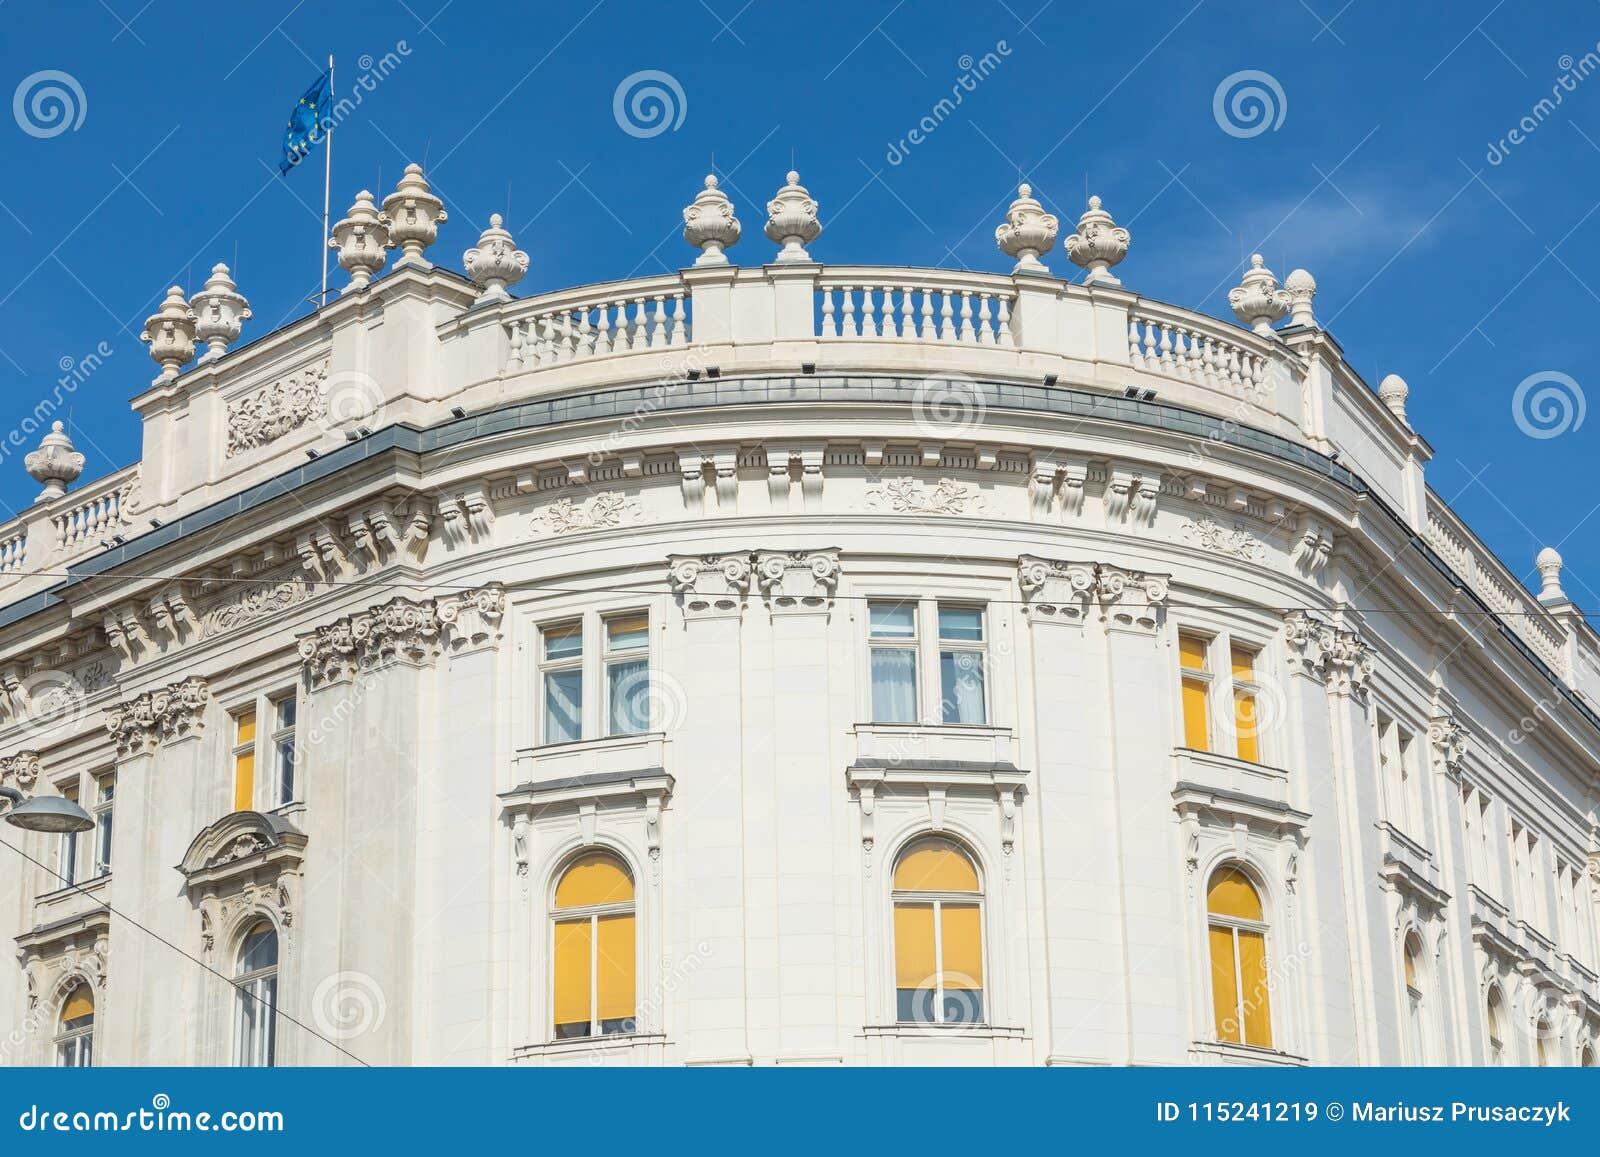 Traditionell arkitektur i gammal stad i Wien, Österrike